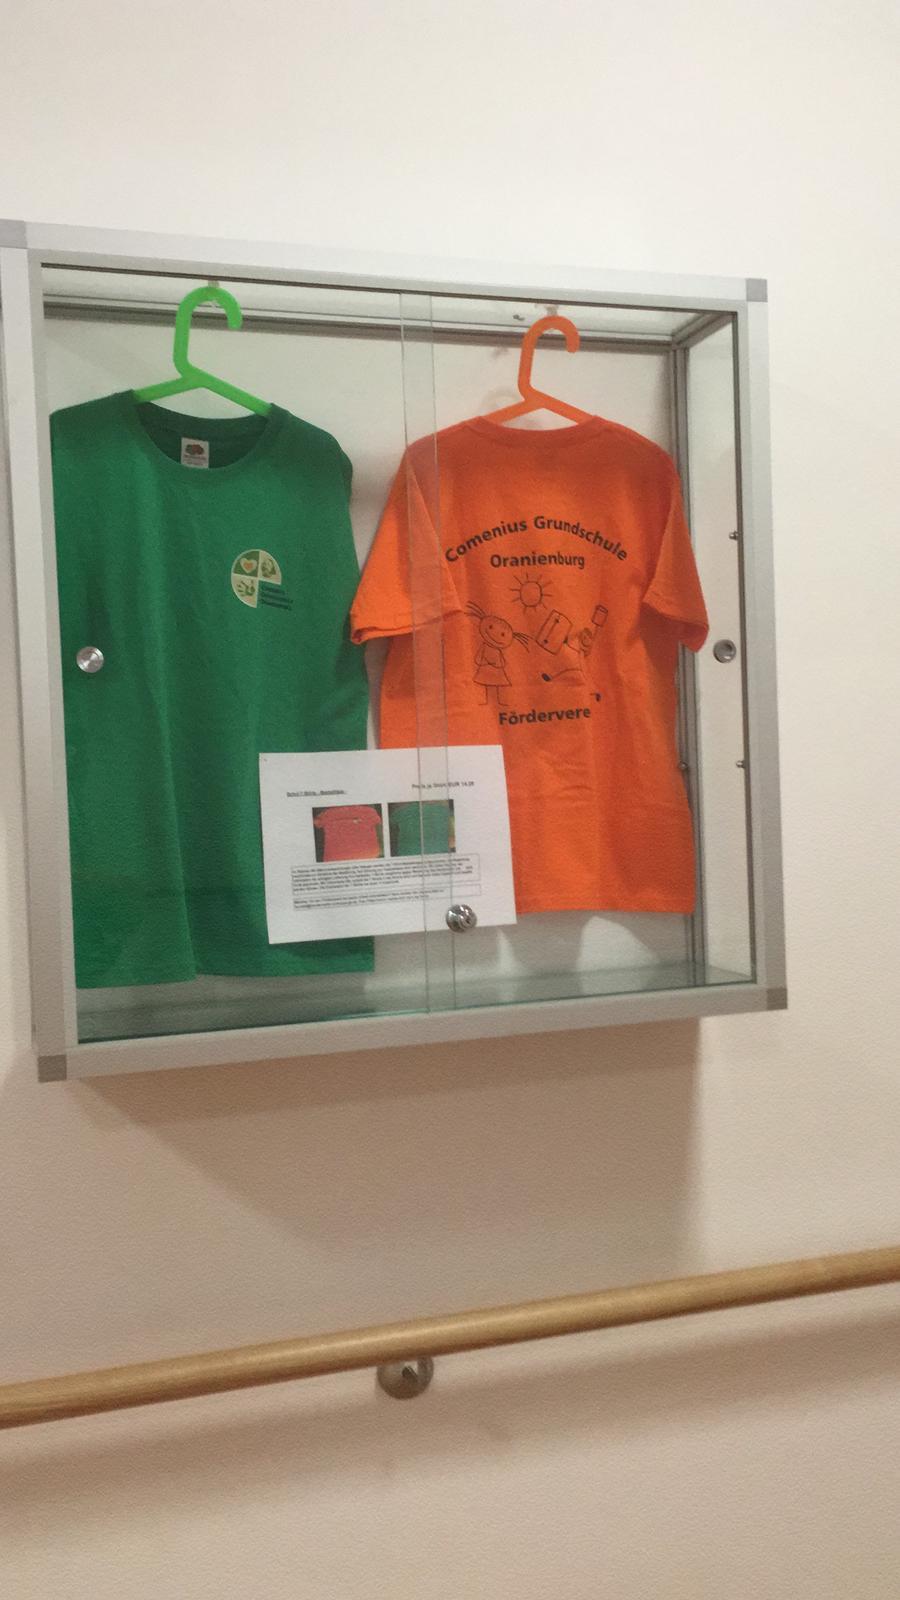 Neue Schul T-Shirts verfügbar